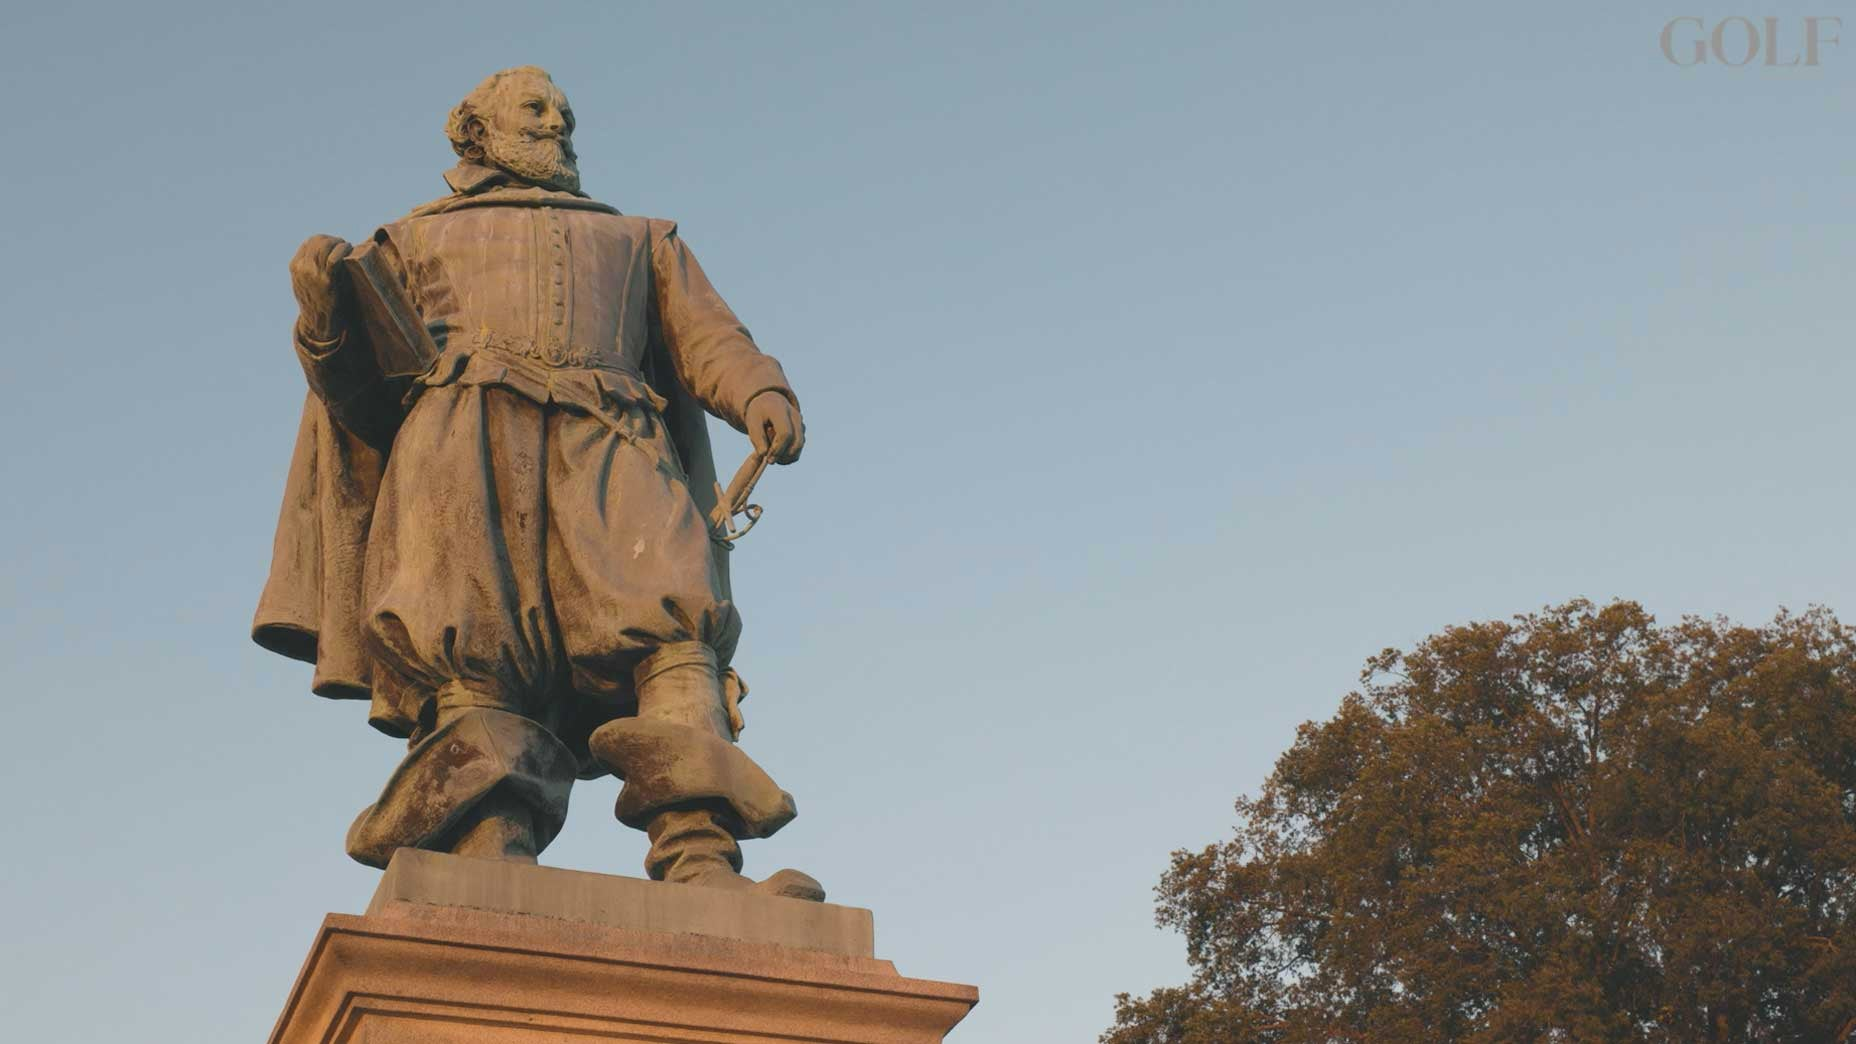 statue jamestowne island virginia